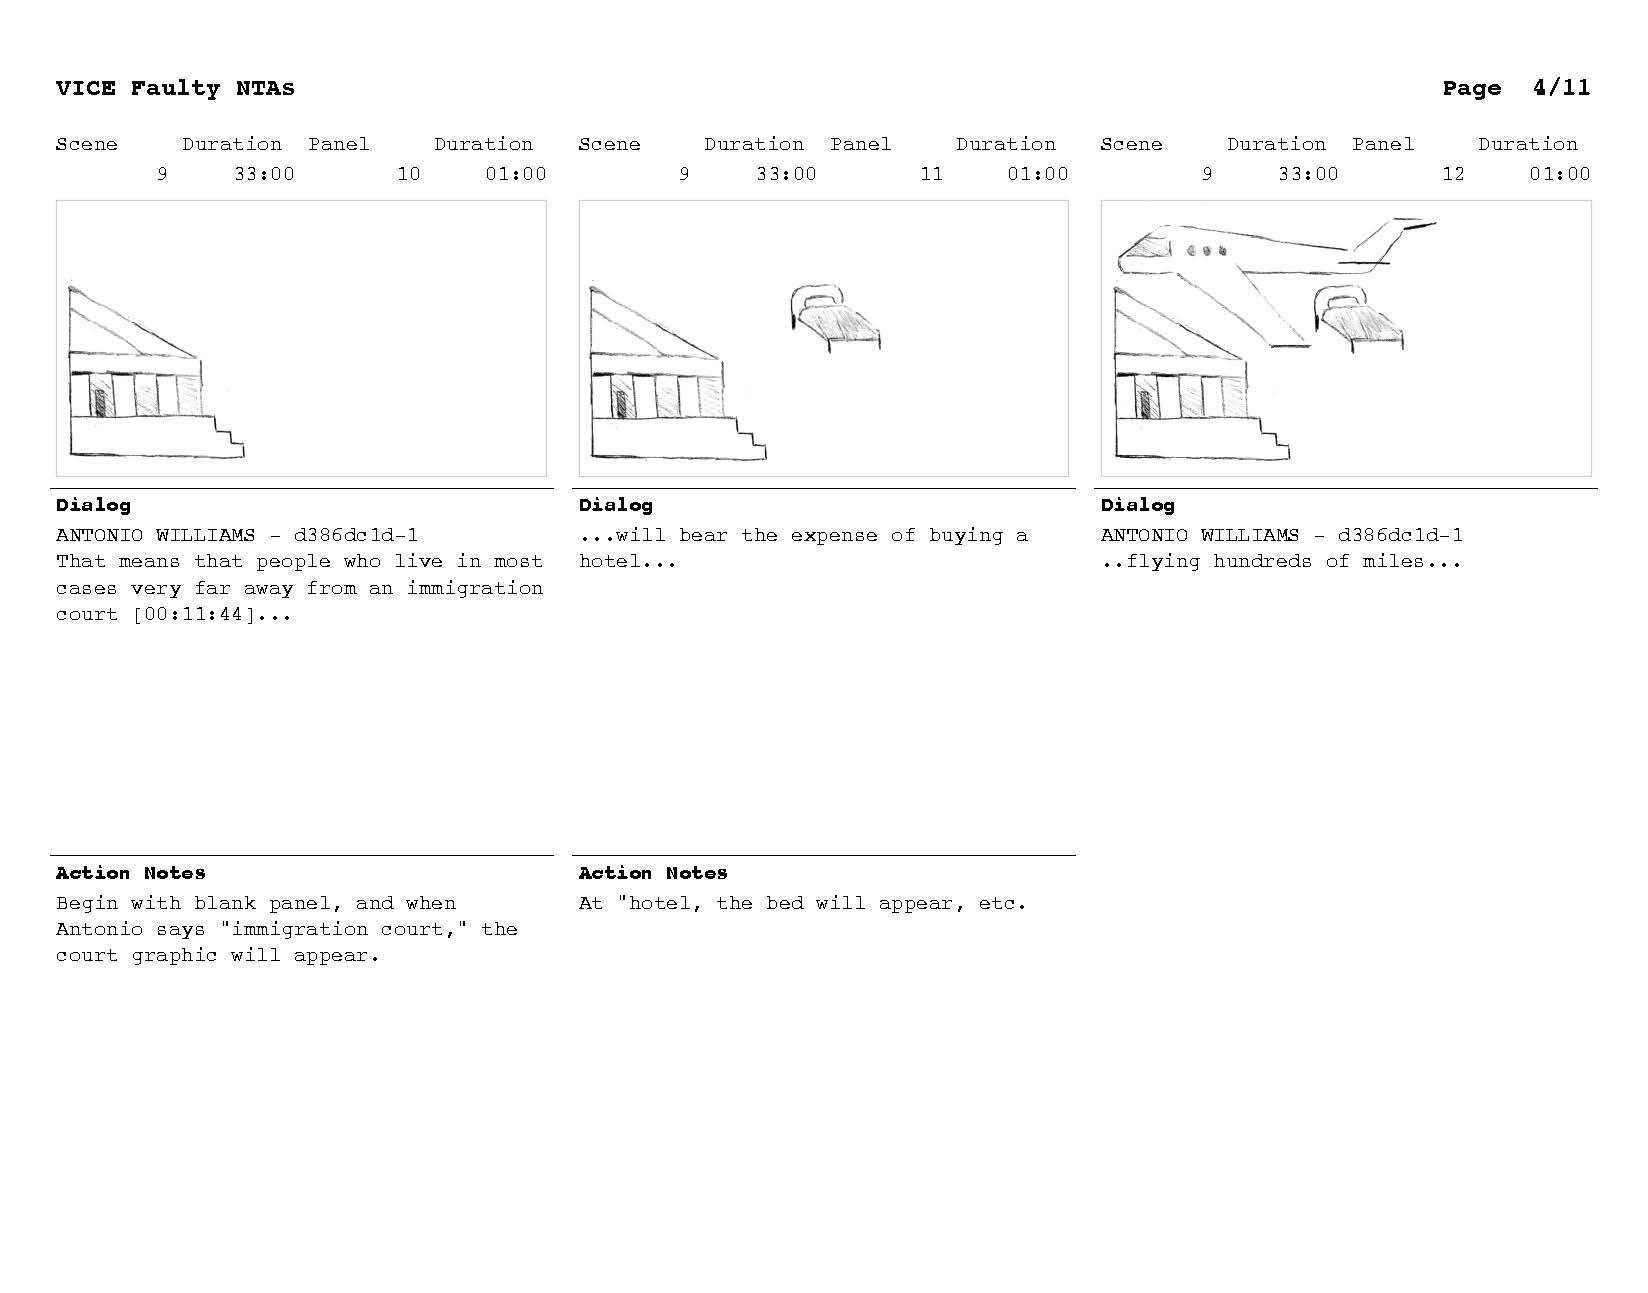 VICE News Tonight - Faulty NTAs storyboard_Page_04.jpg